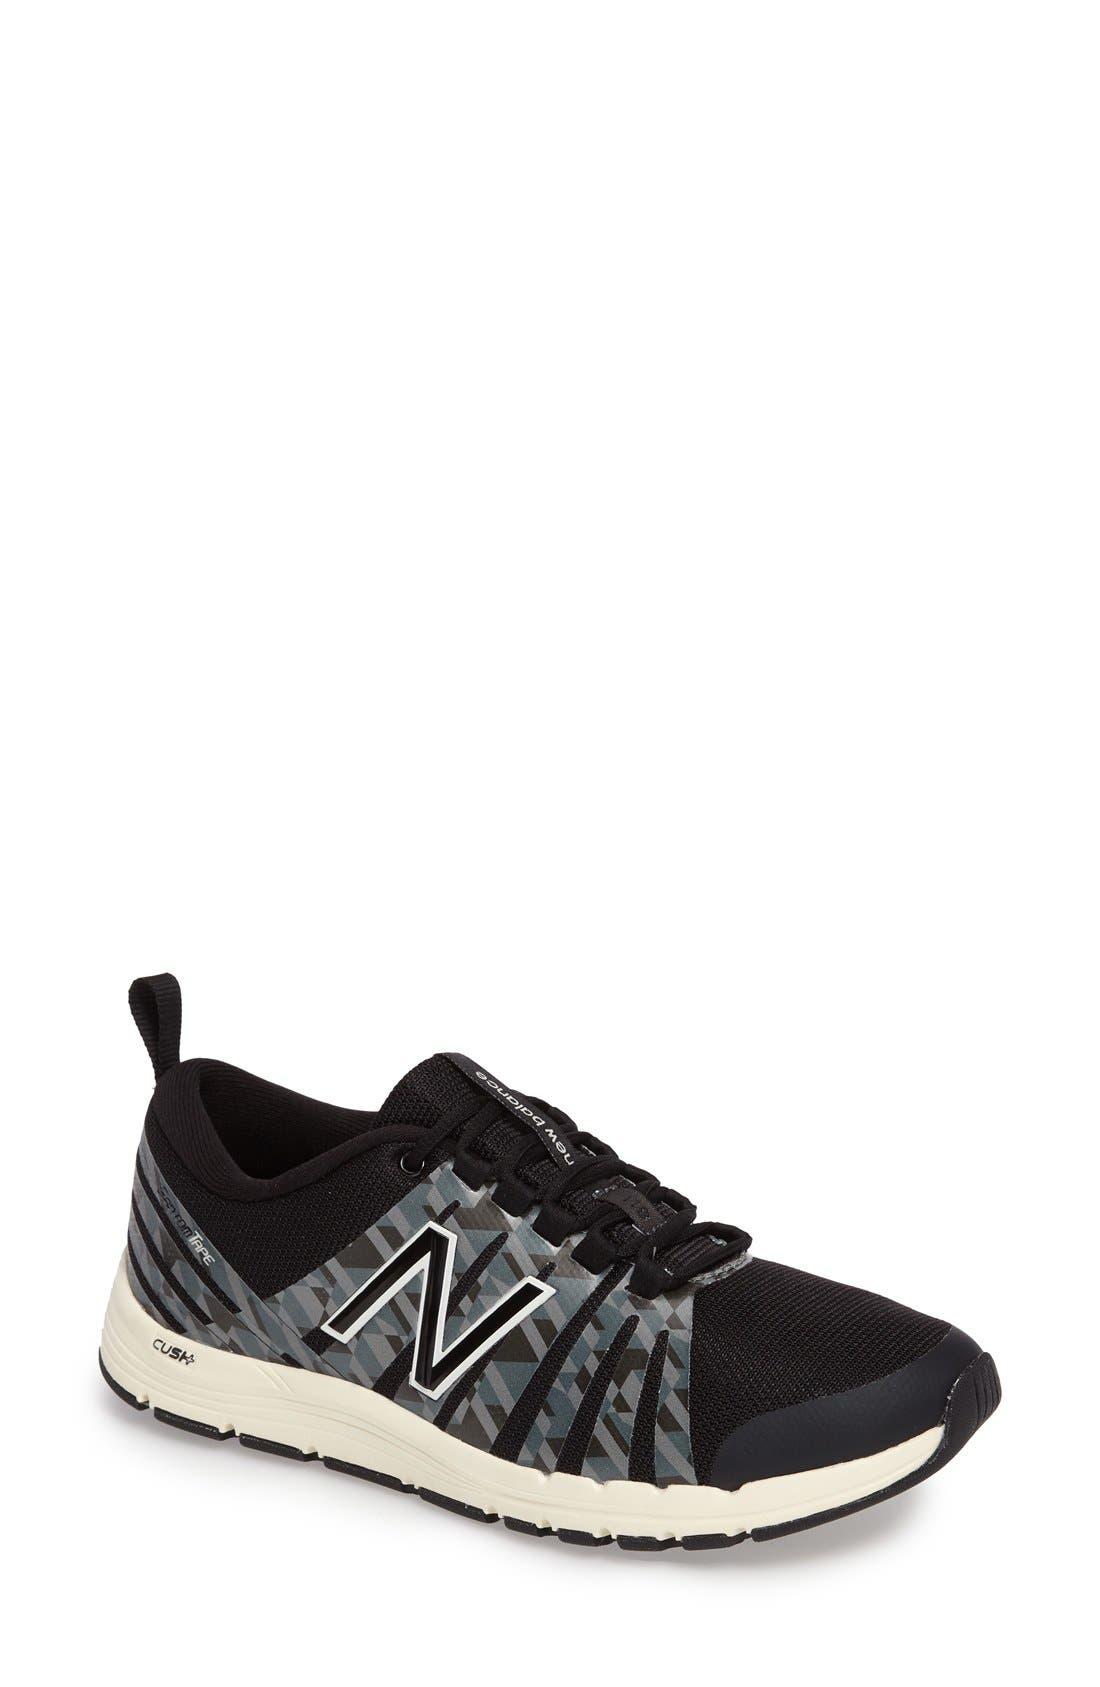 Main Image - New Balance WX811FC Training Shoe (Women)